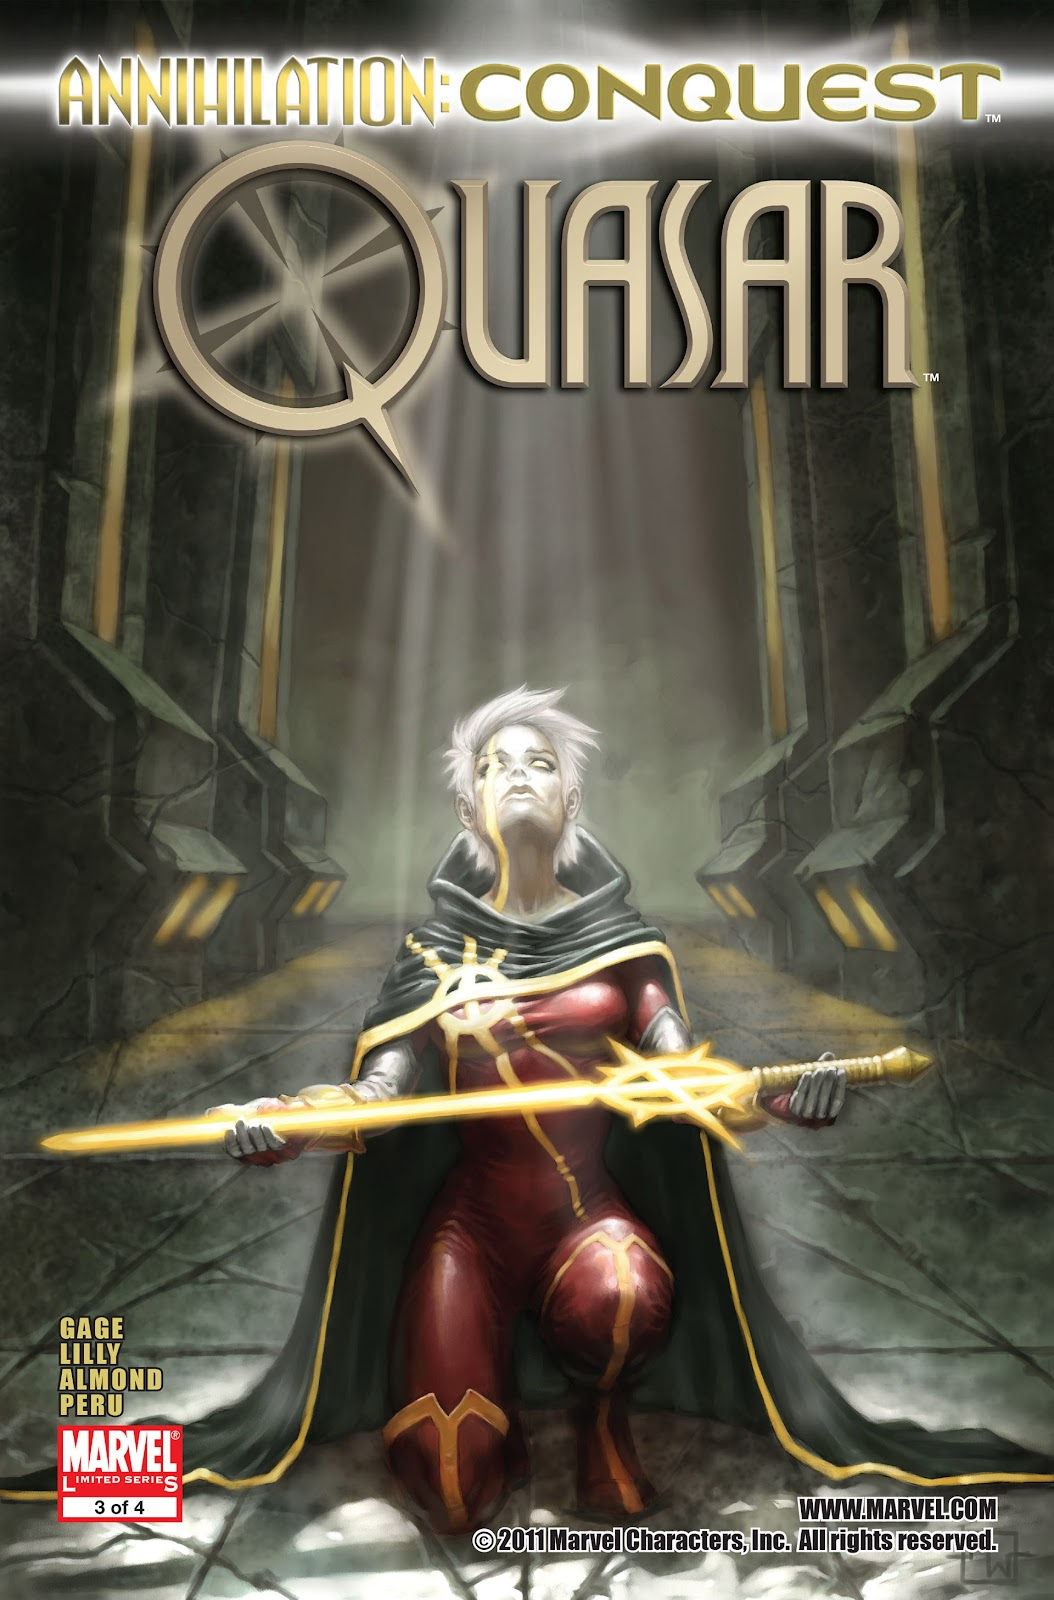 Annihilation: Conquest - Quasar issue 3 - Page 1